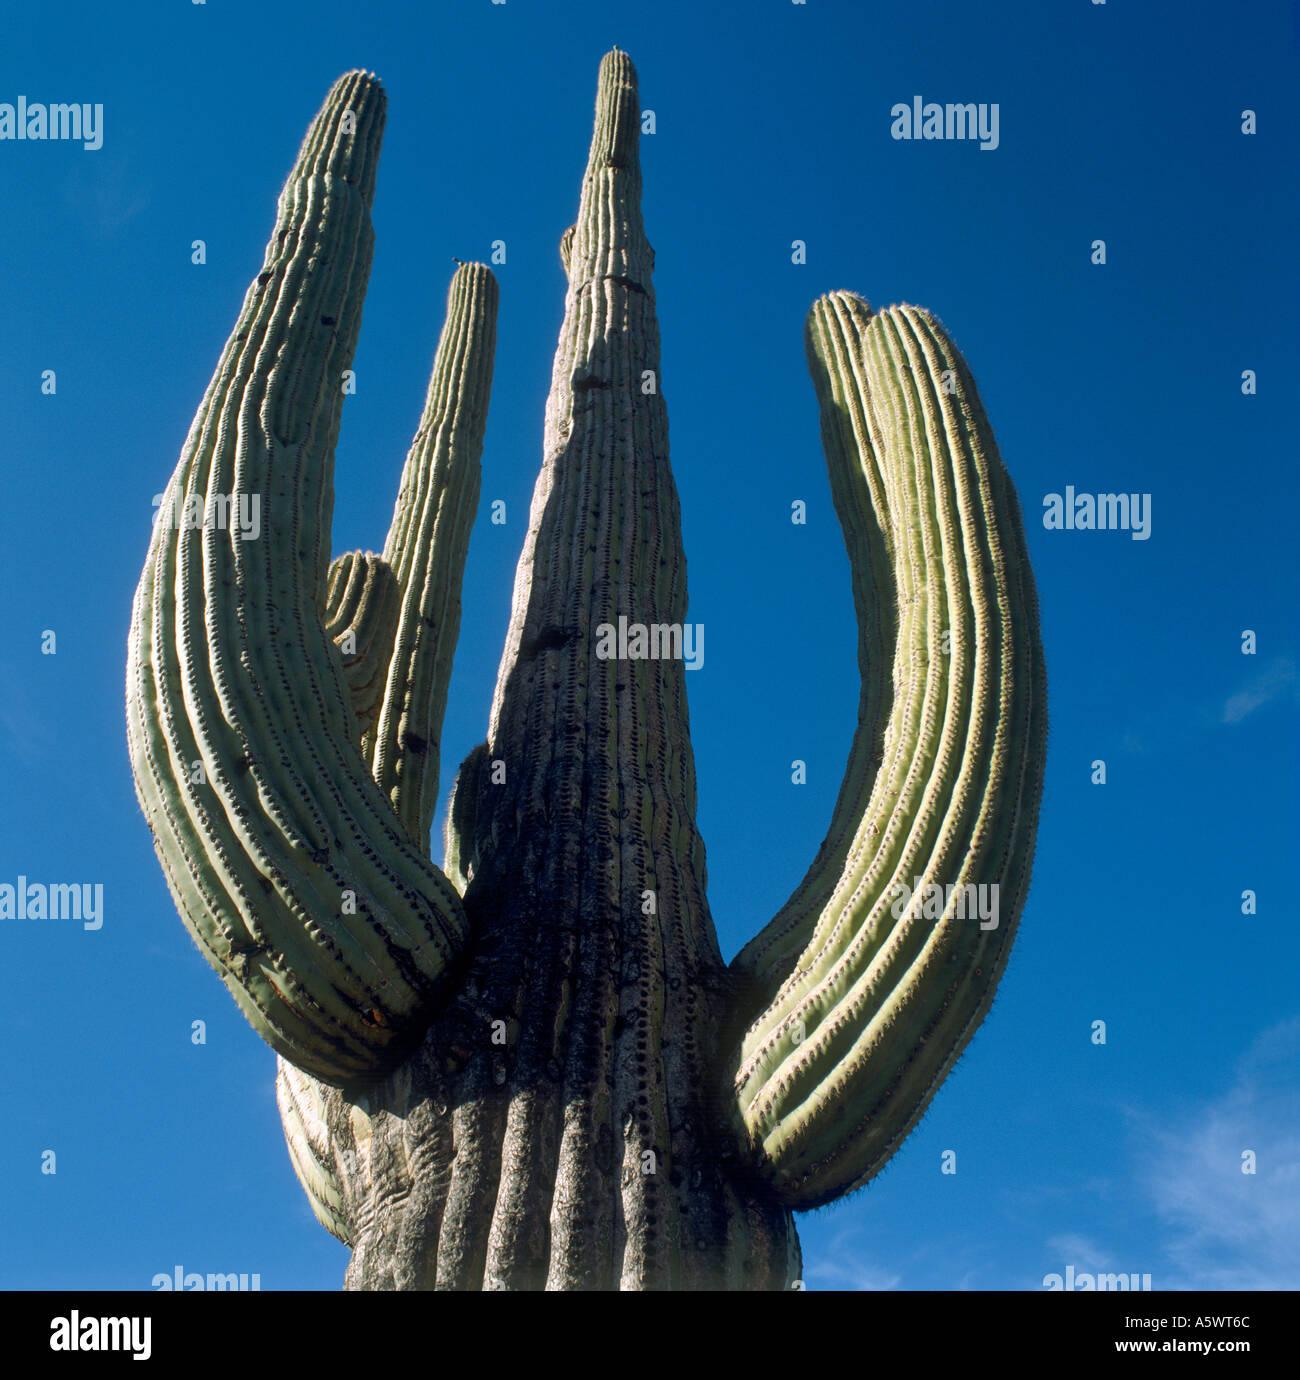 Cactus gigante saguaro, Arizona, EE.UU. Foto de stock